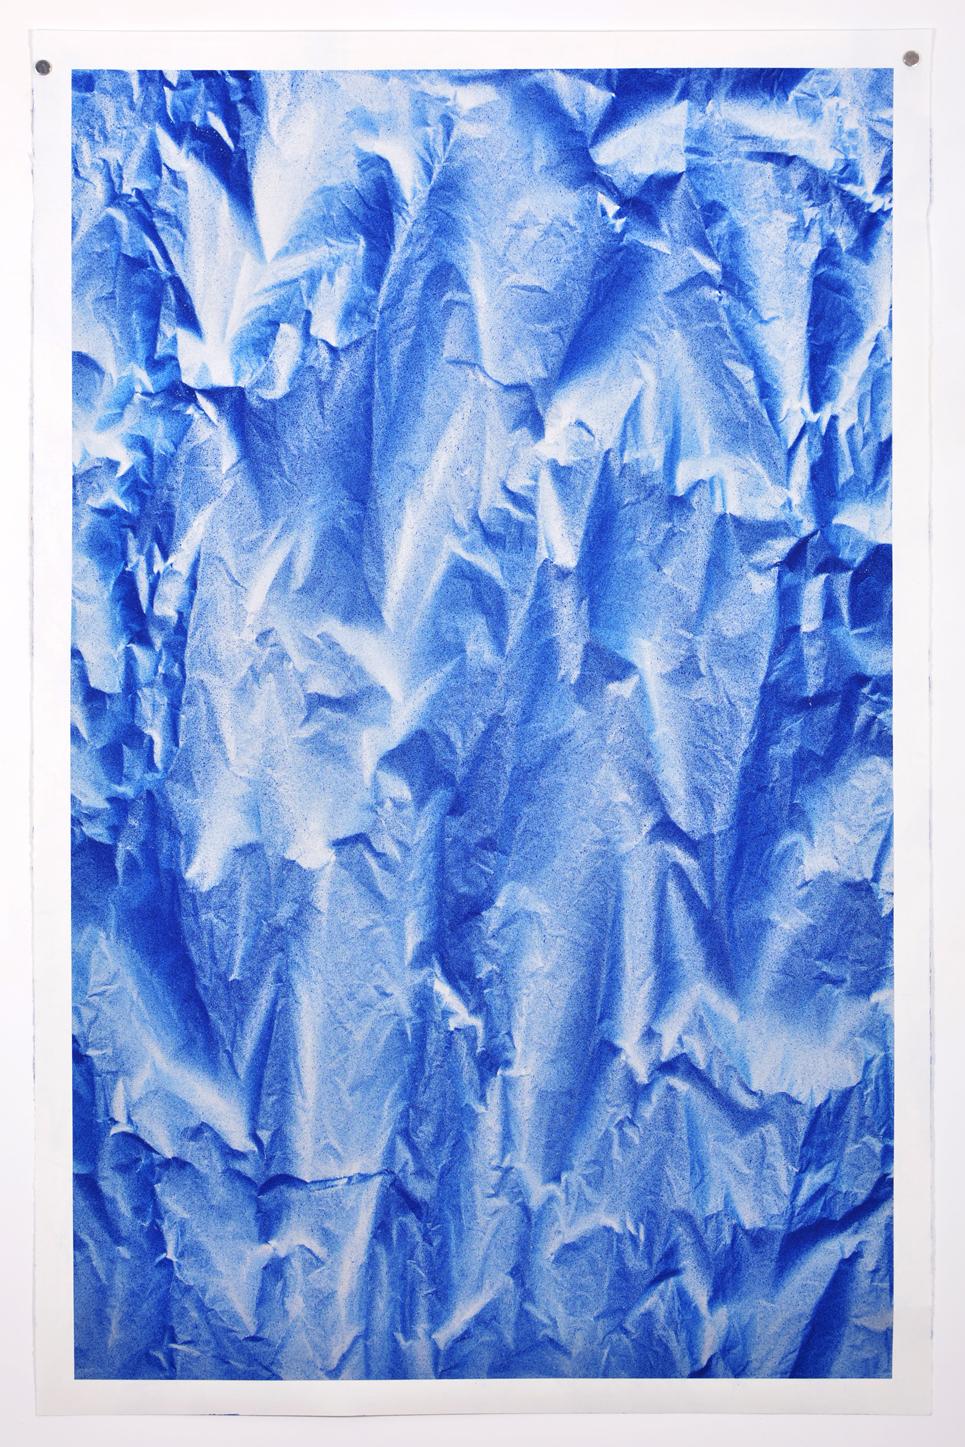 Benjamin Ottoz_ Double V Gallery_115x180cm Bleu Elec (2).jpg